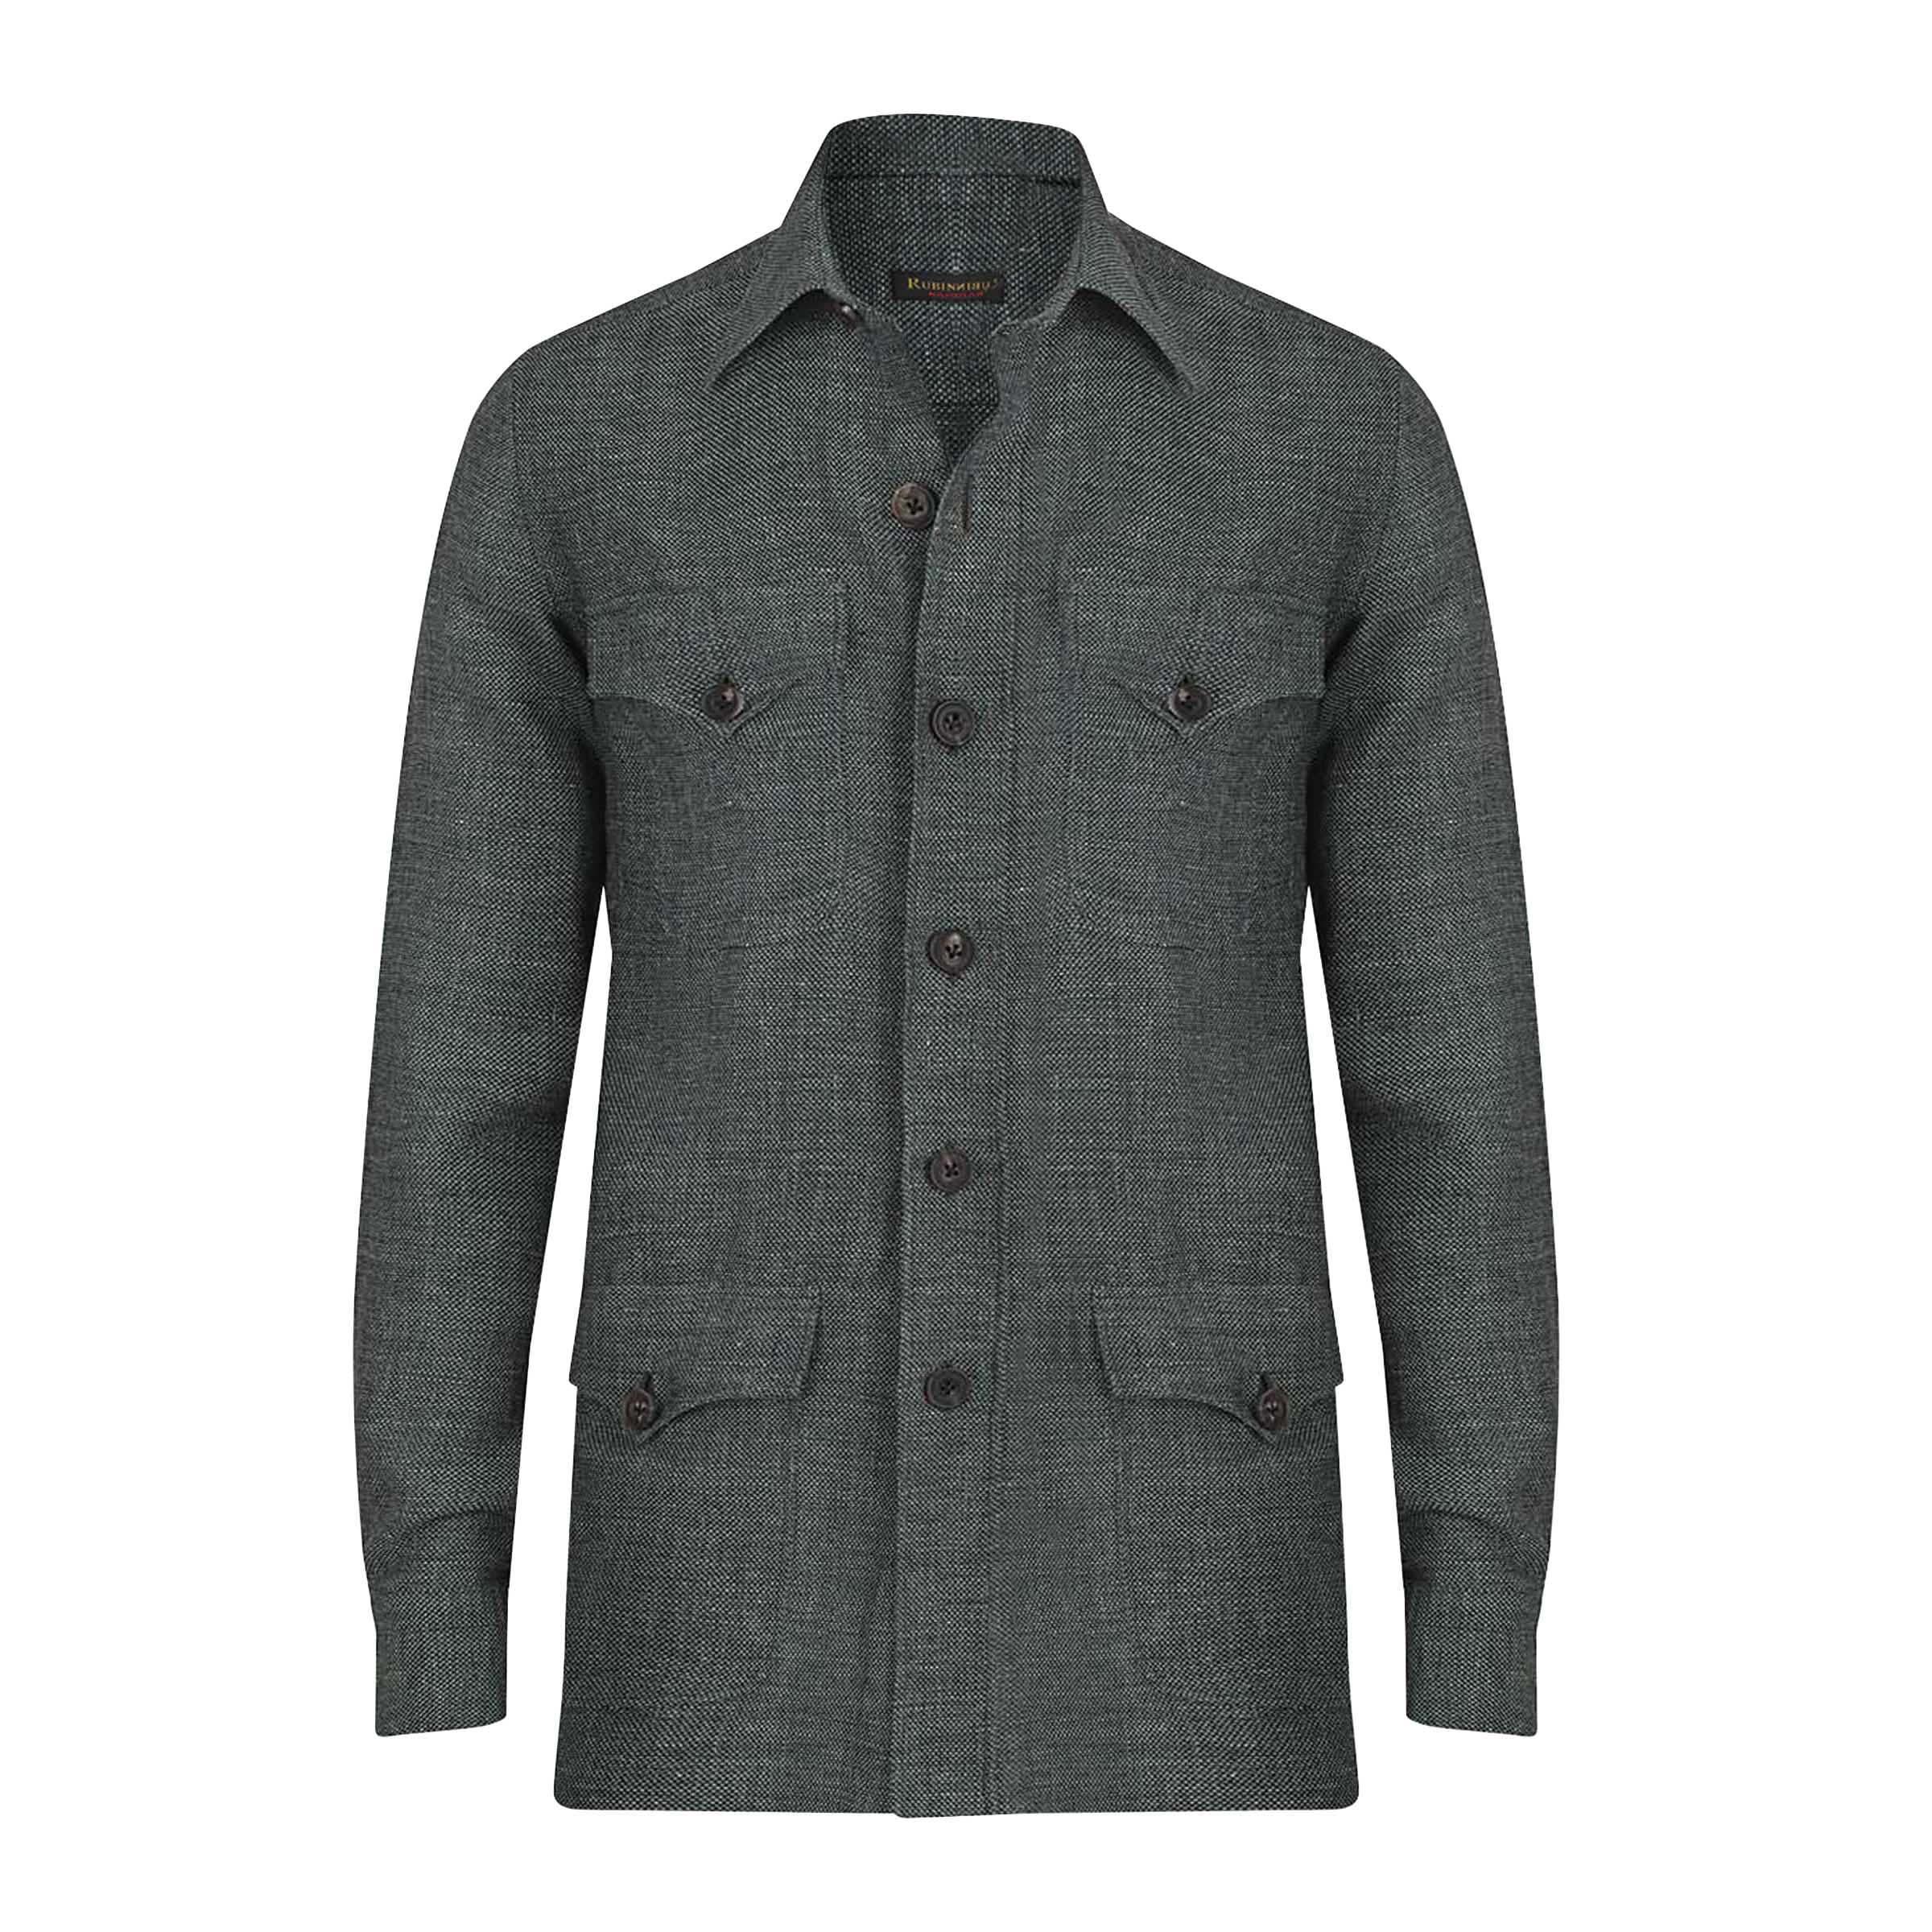 Green Linen and Wool Safari Jacket